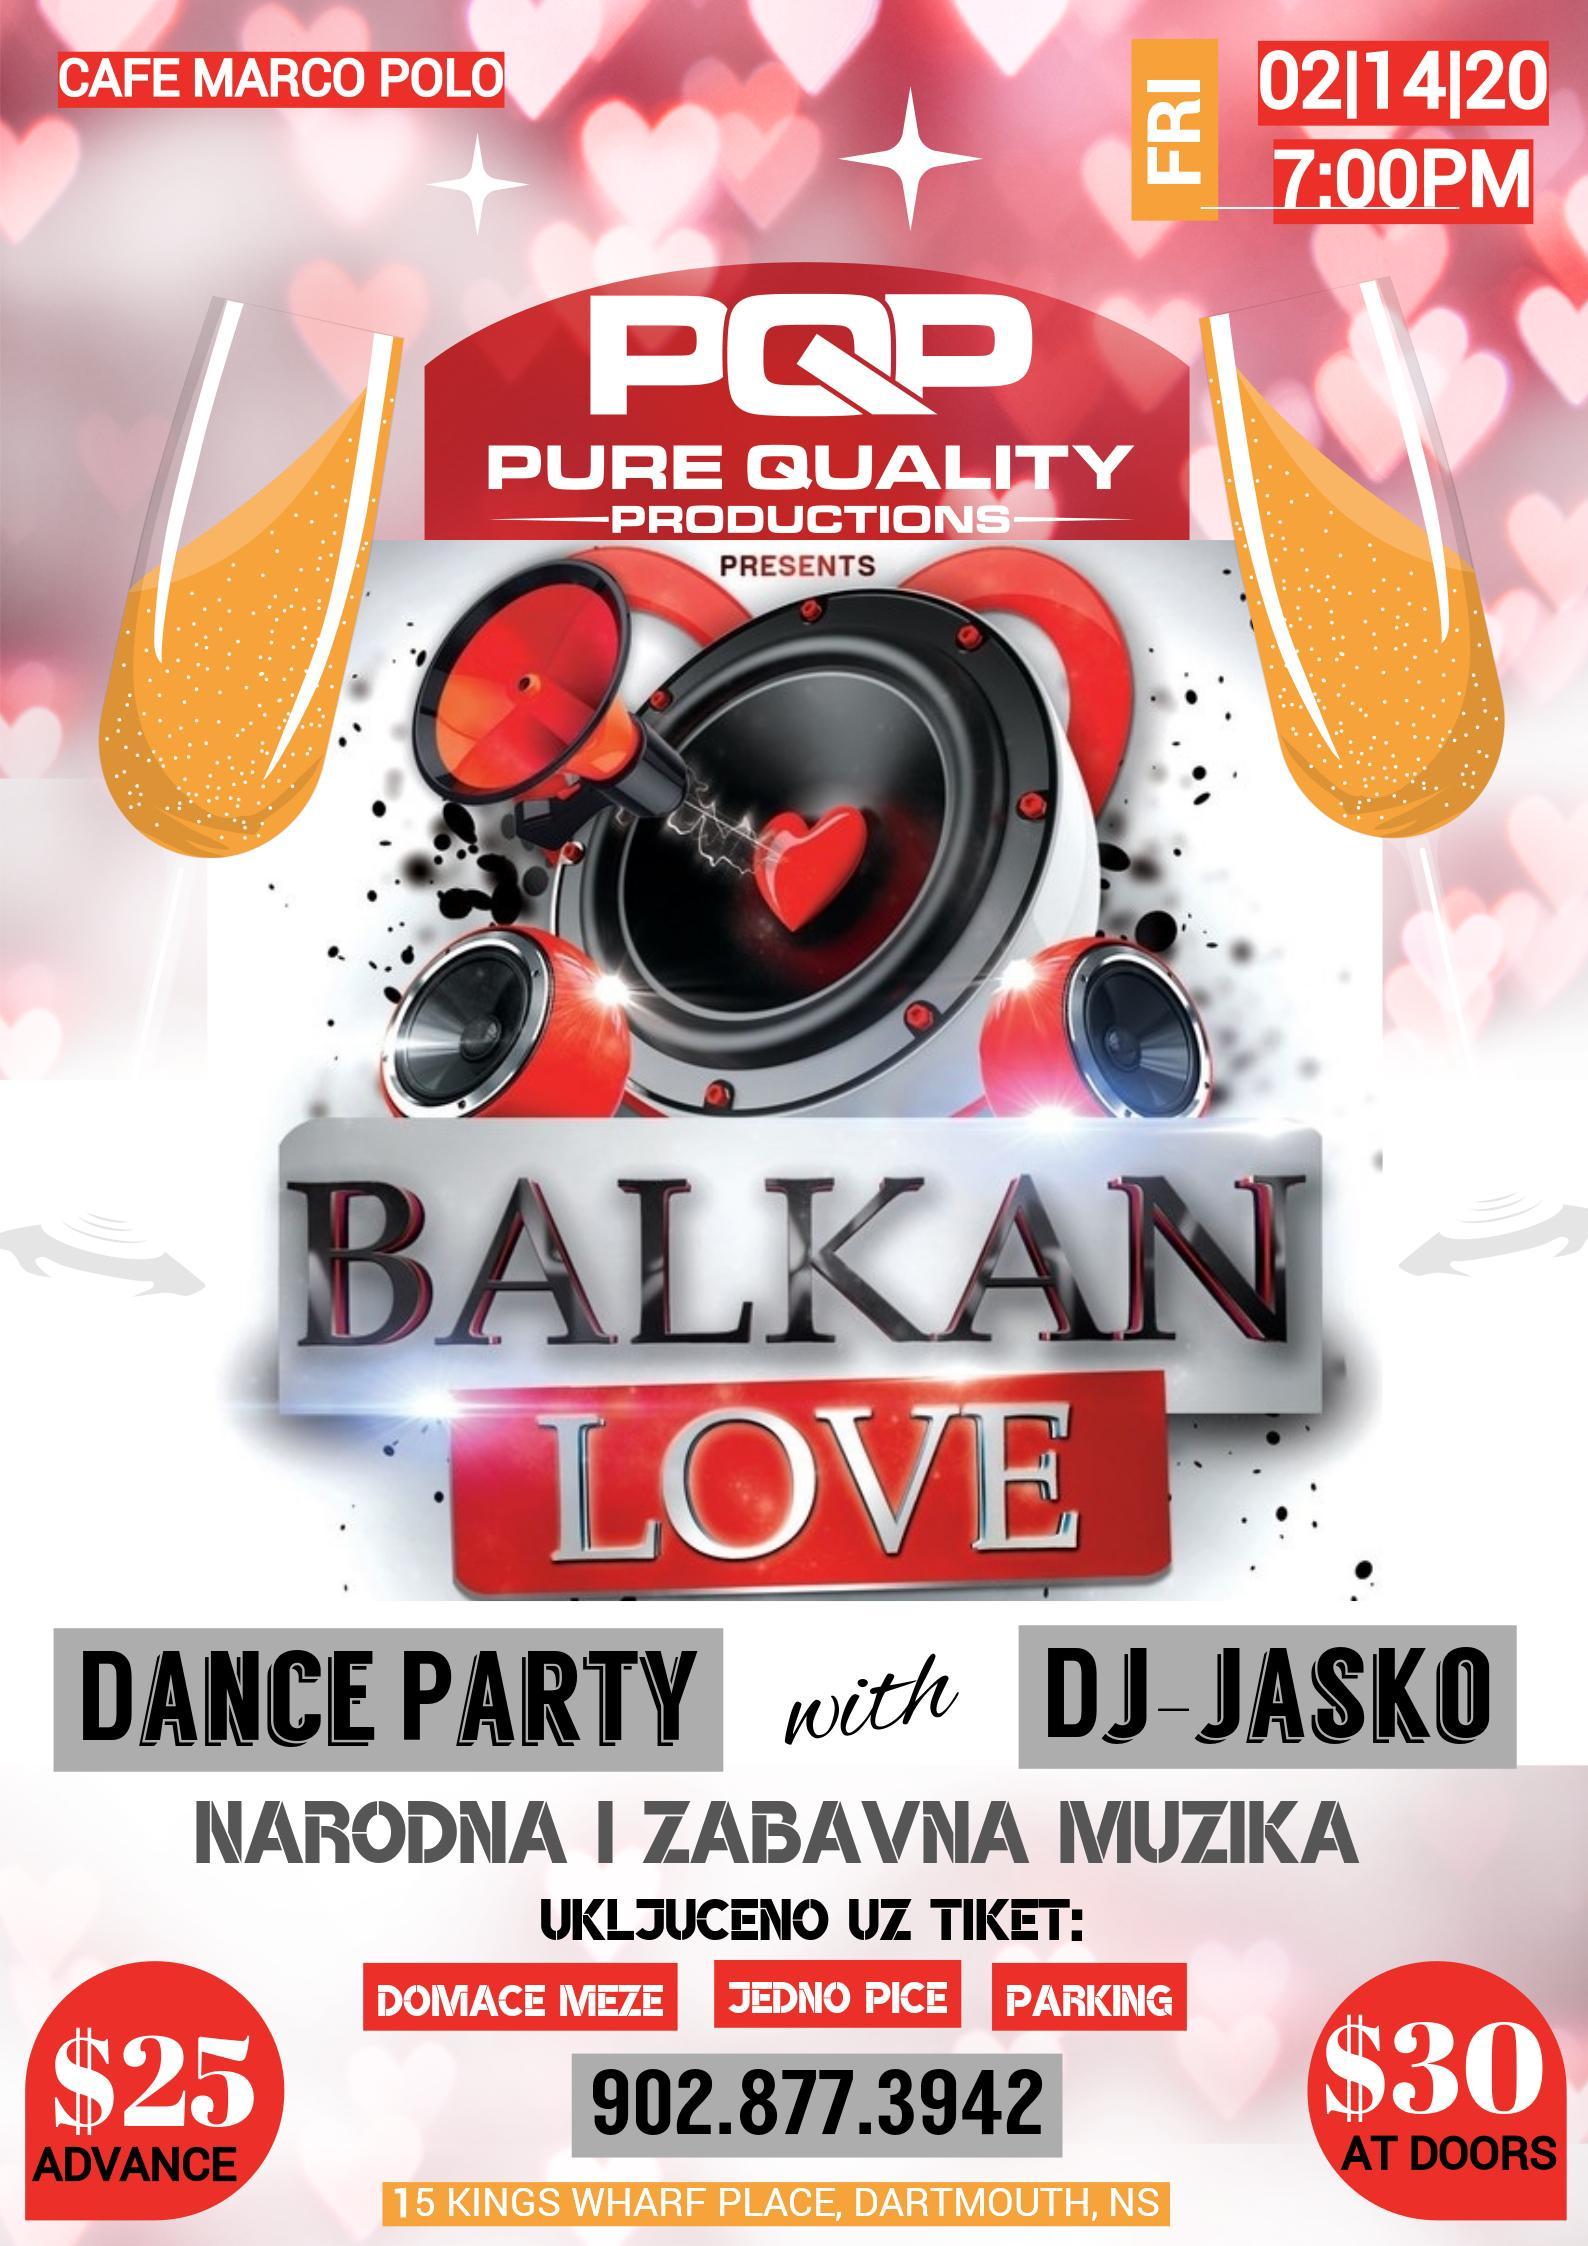 Balkan Love: Dance Party with Dj-Jasko